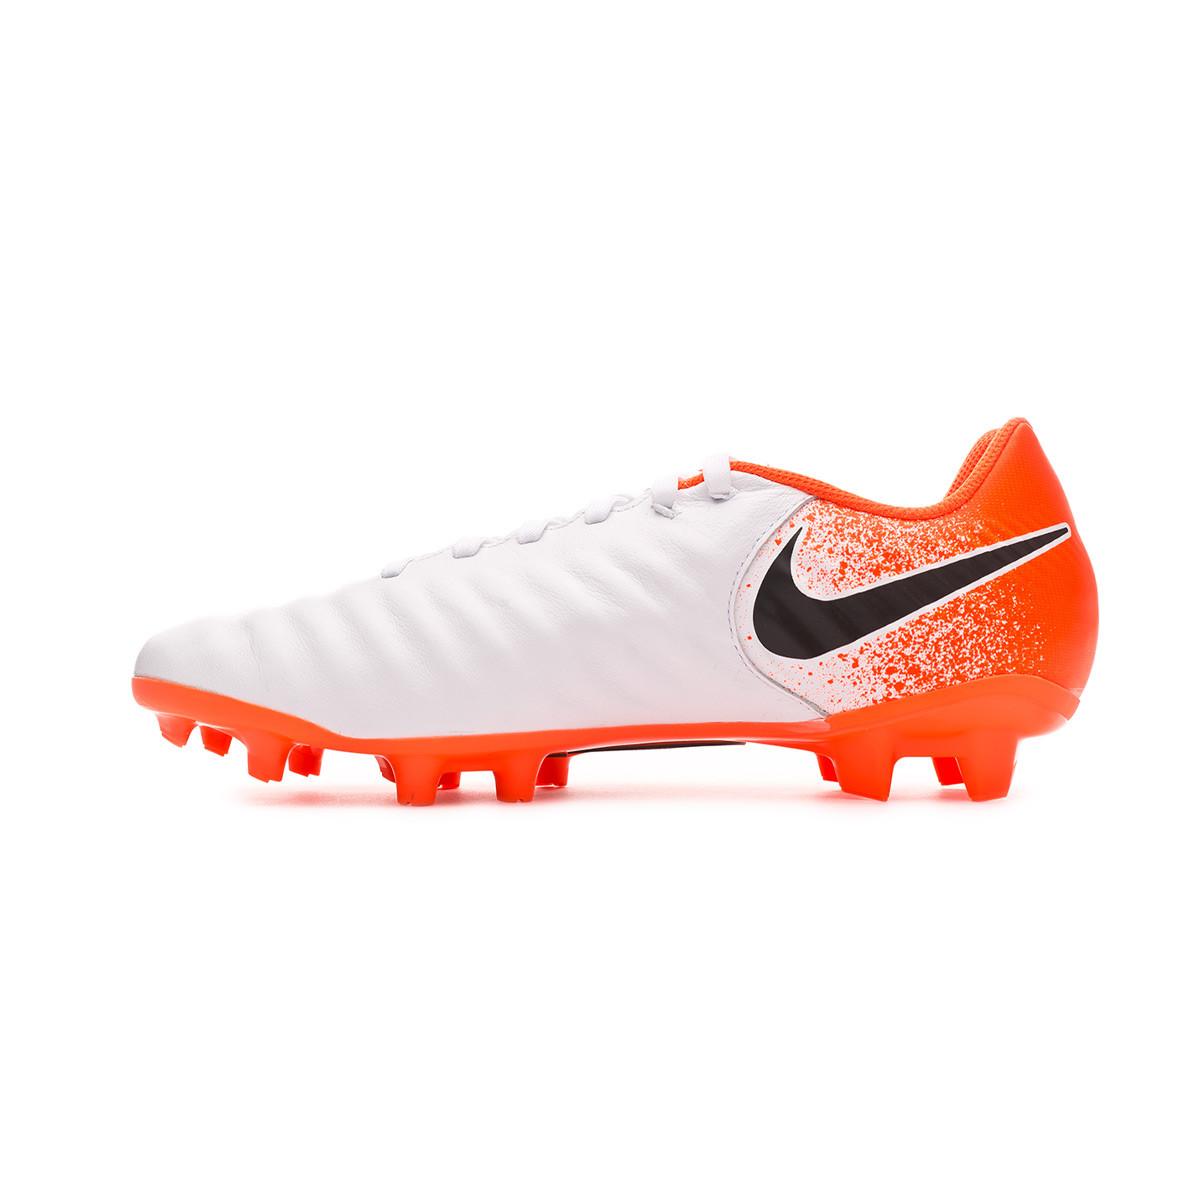 Chaussure de foot Nike Tiempo Legend VII Academy FG